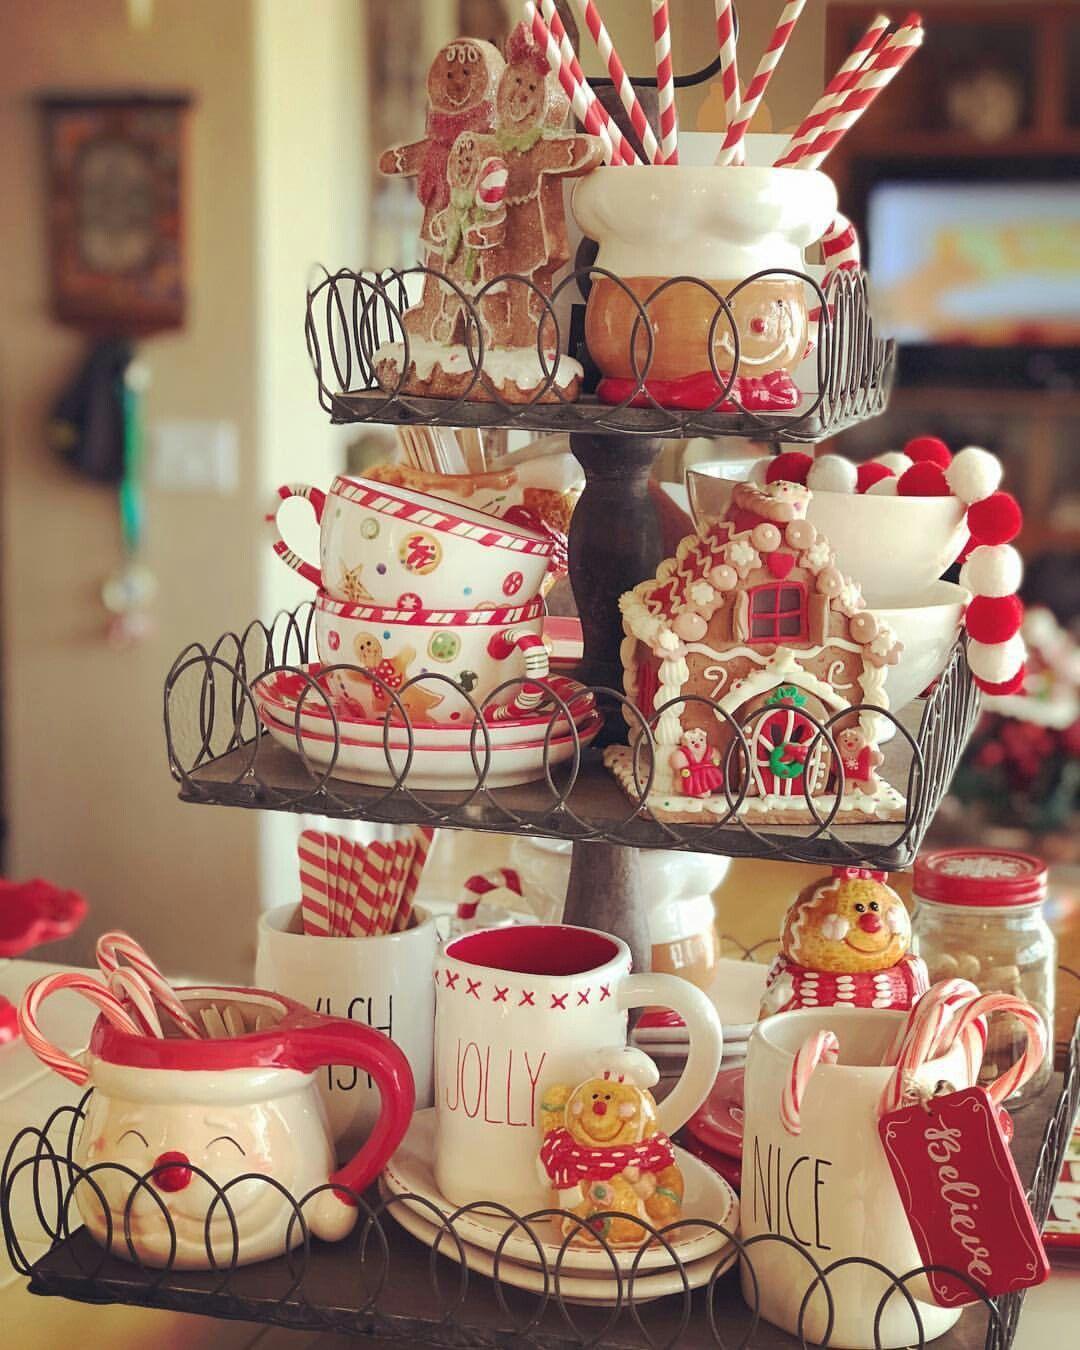 Christmas Kitchen Setup/Decor